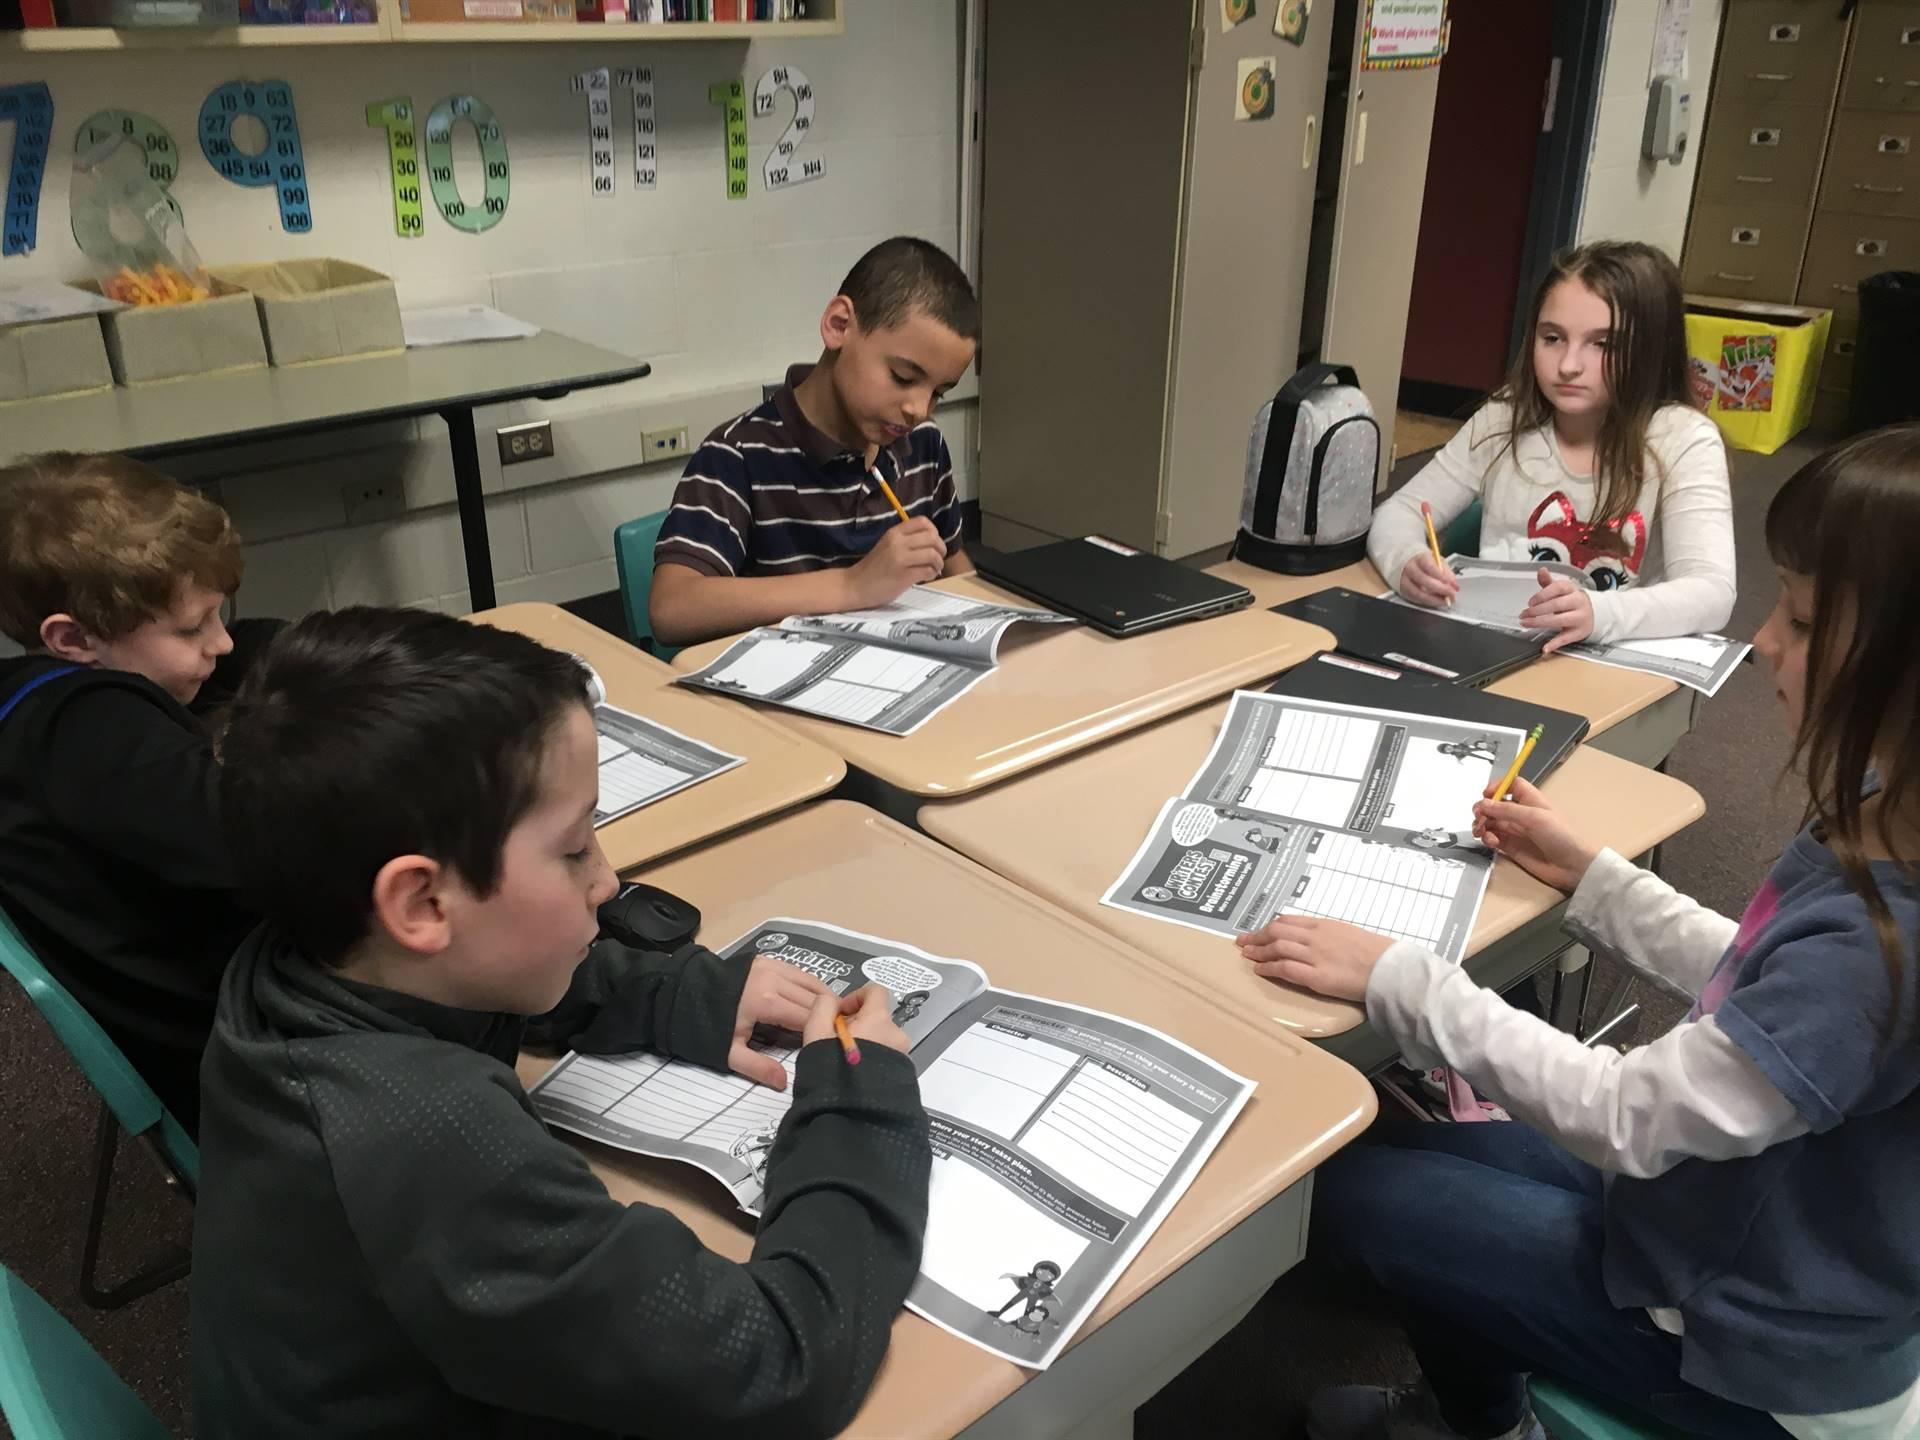 Five students working at desks